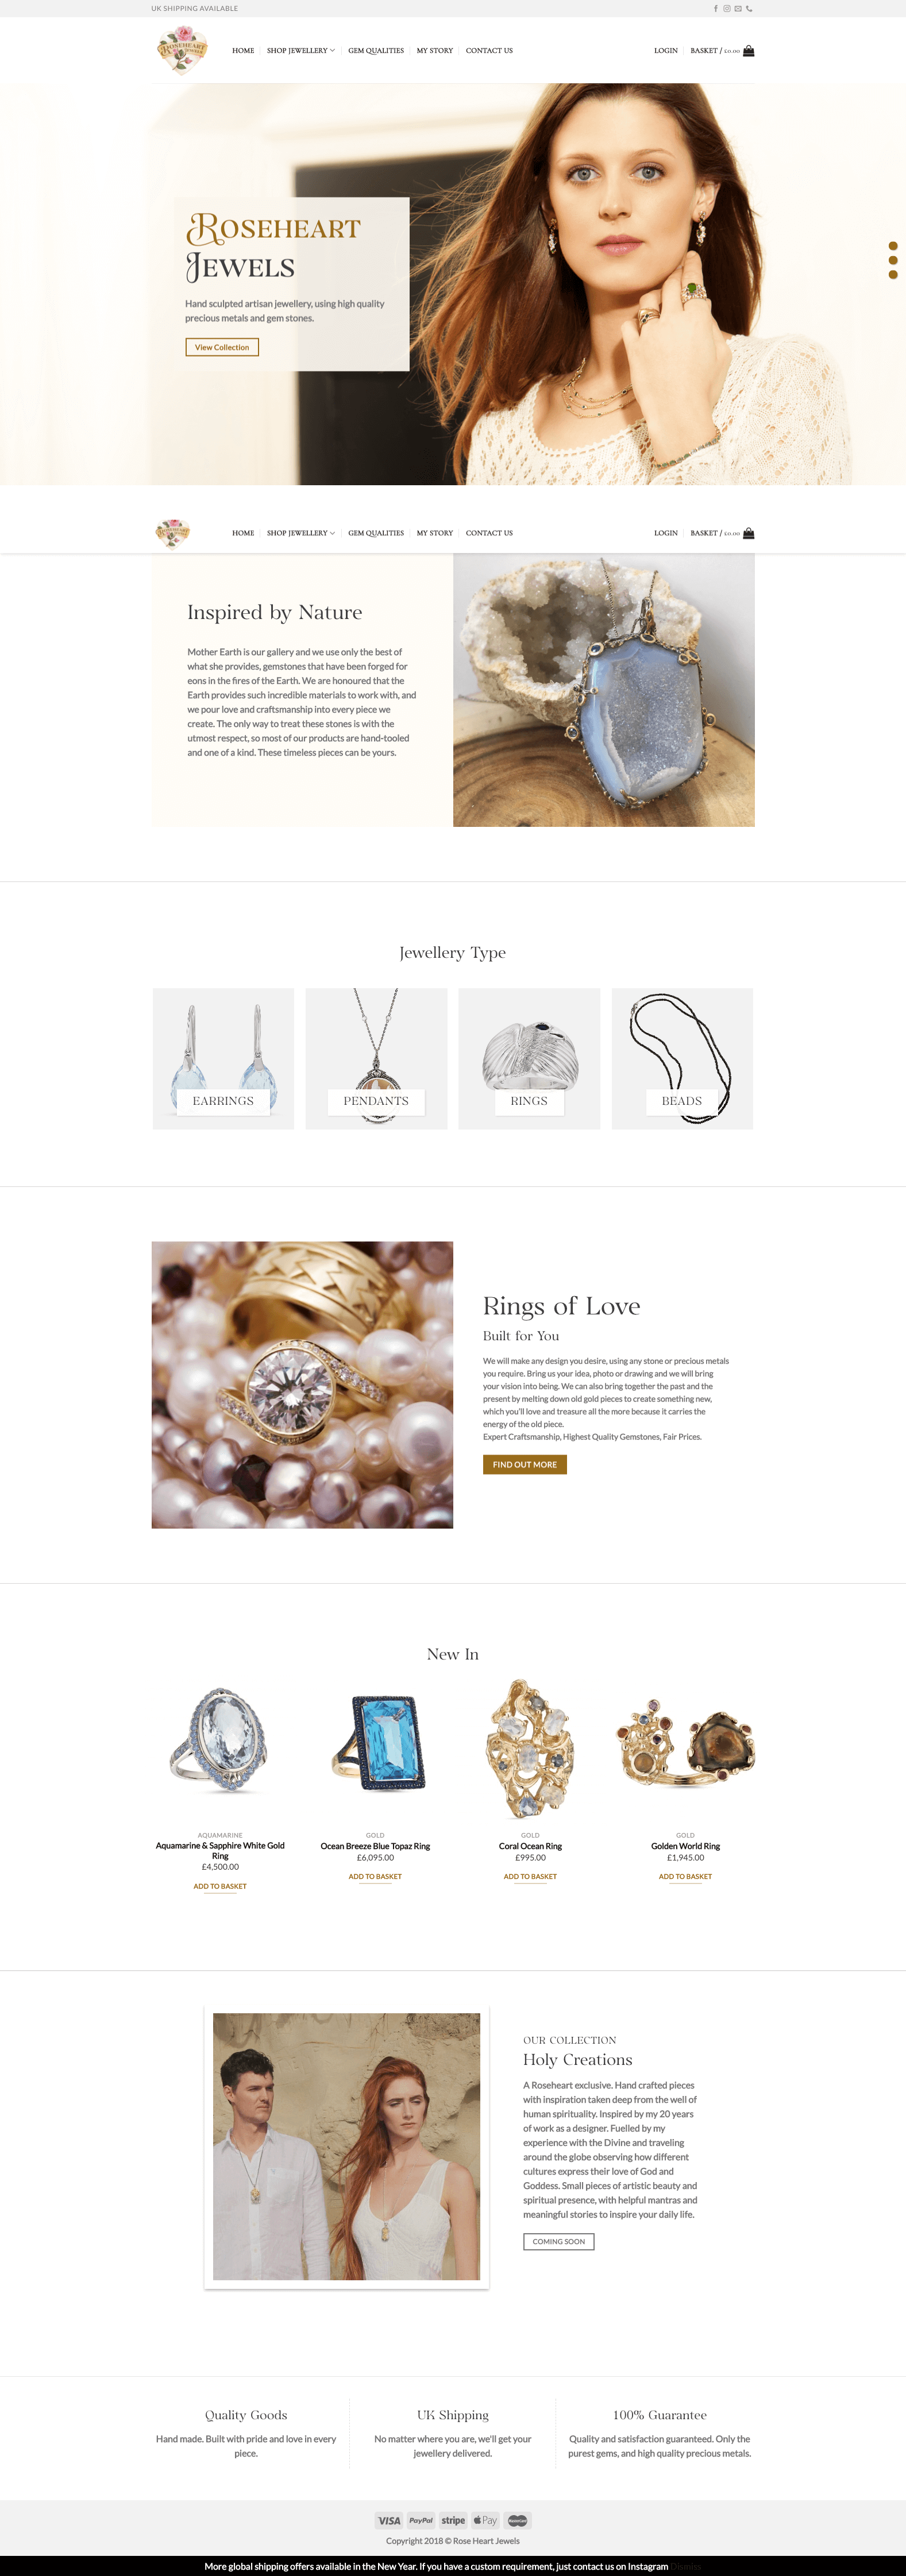 Roseheart Jewels   Web Build